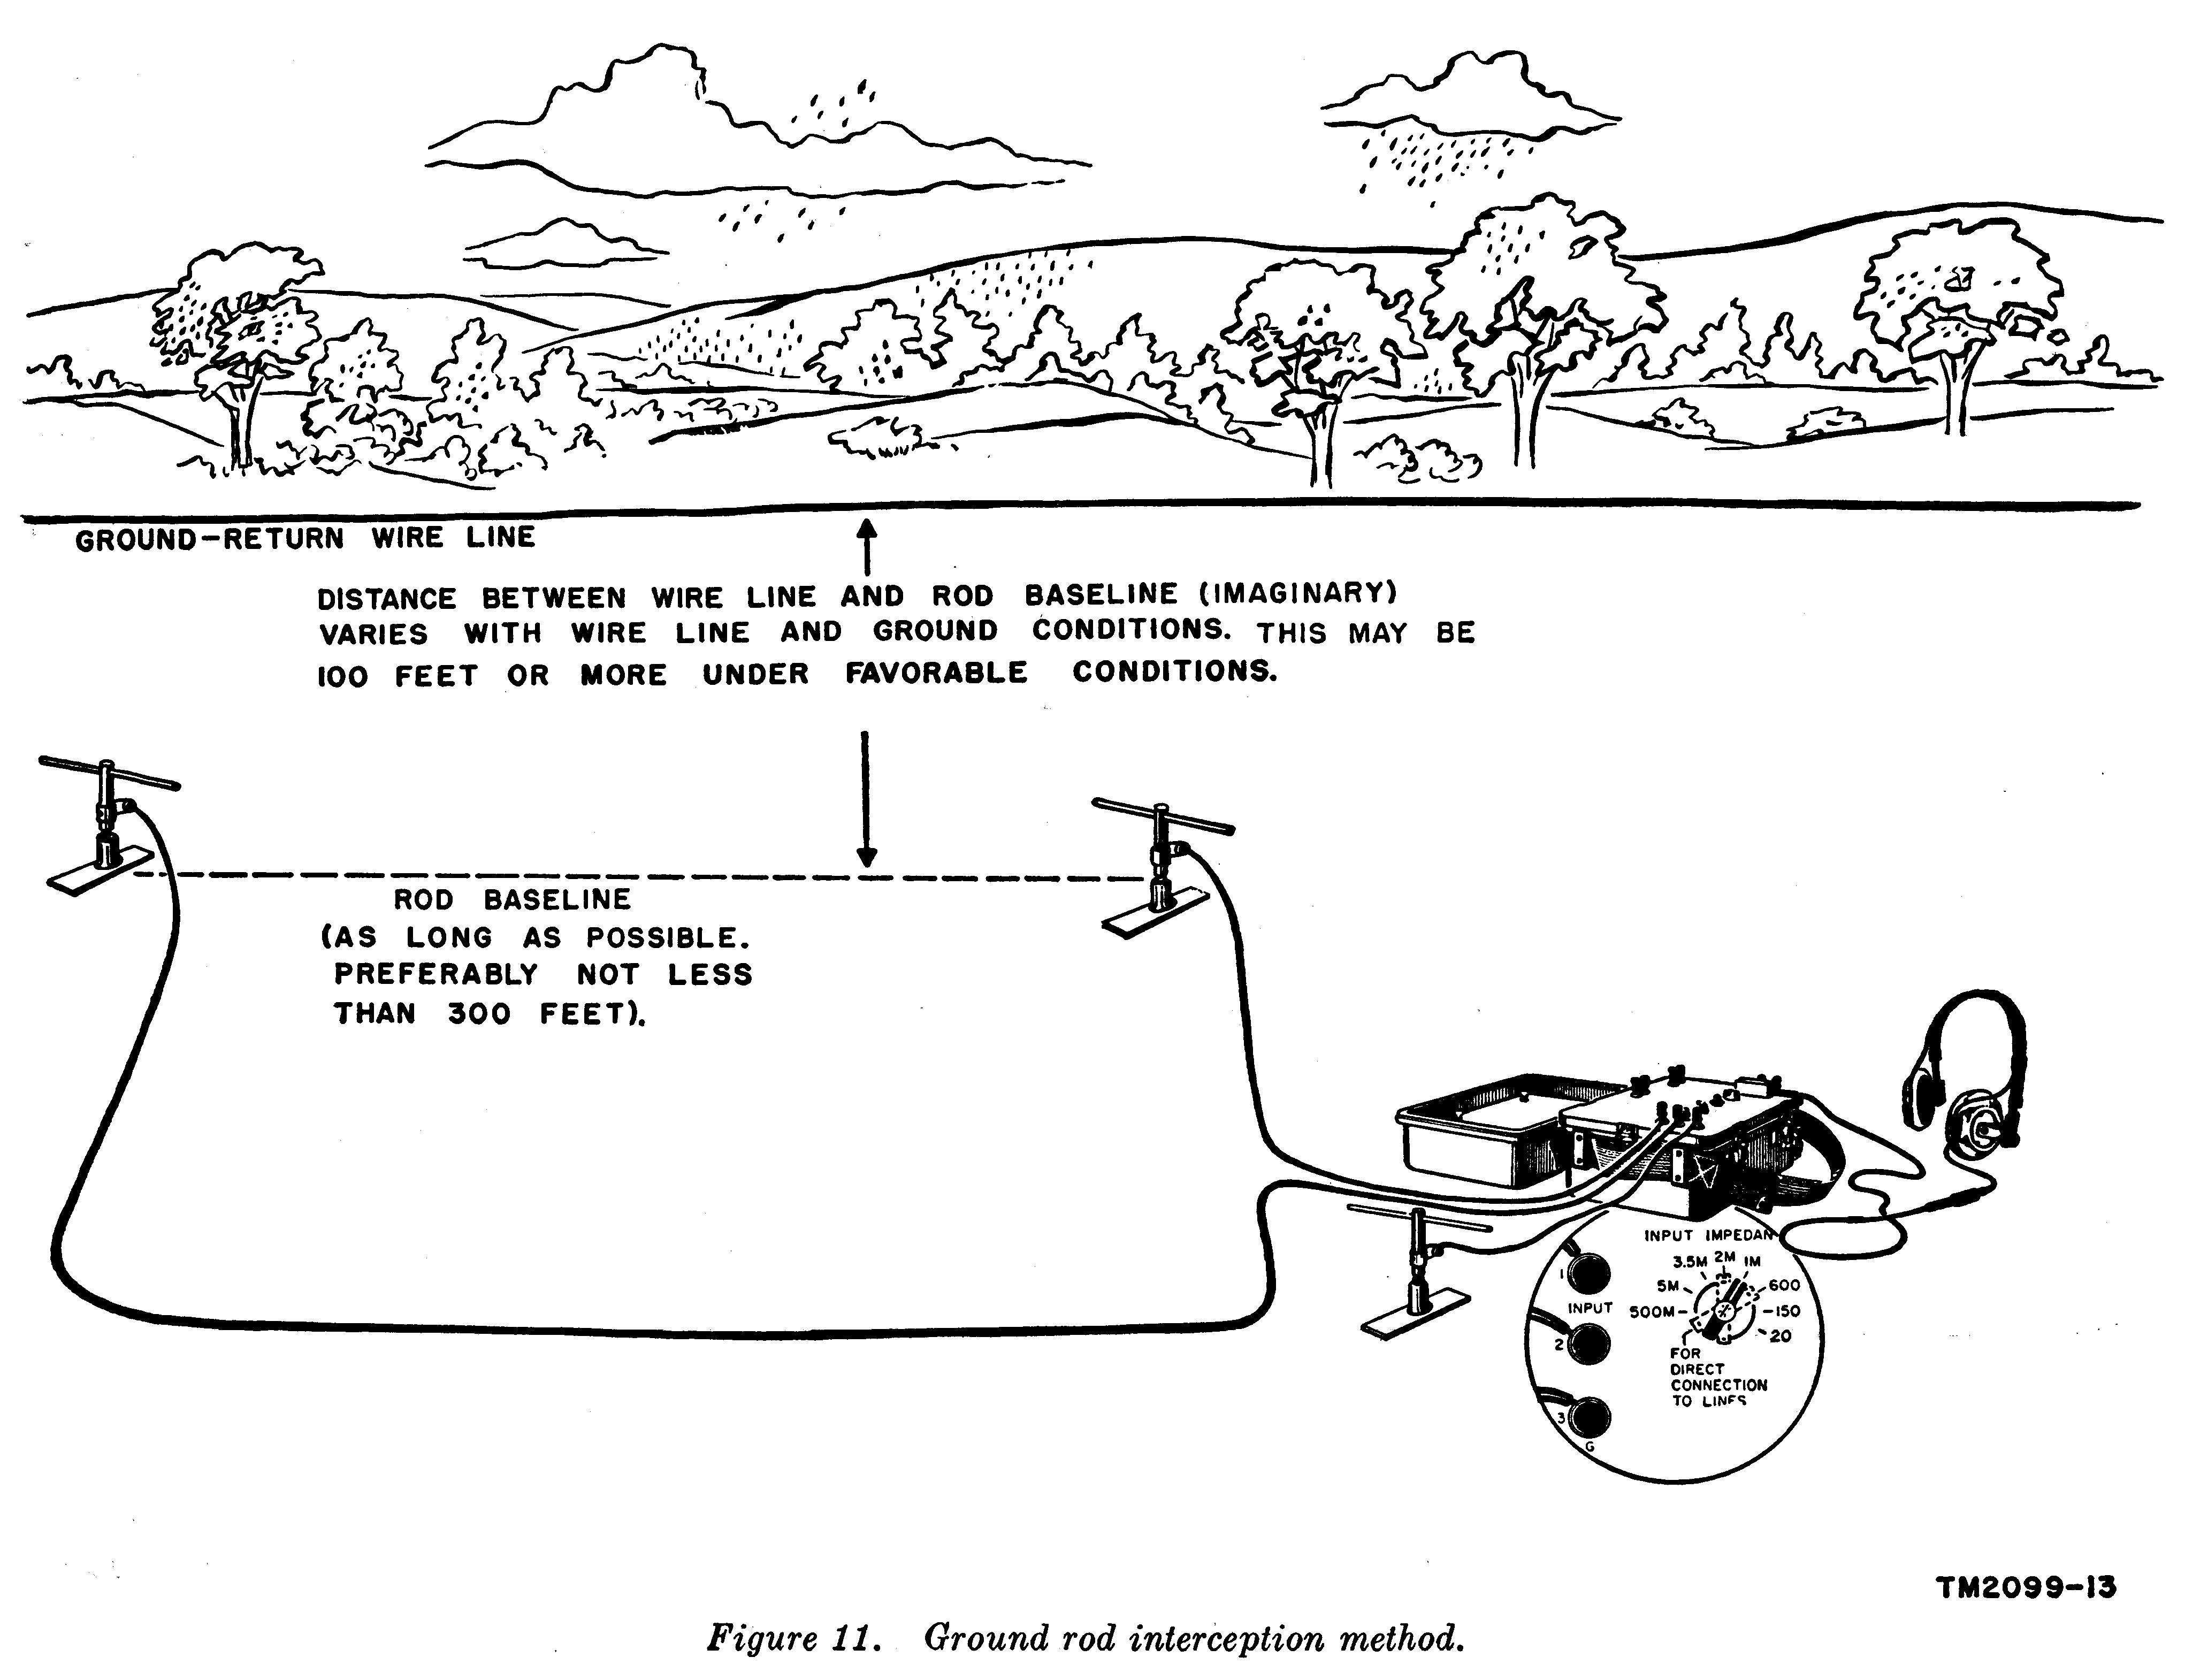 Ground rod interception method.